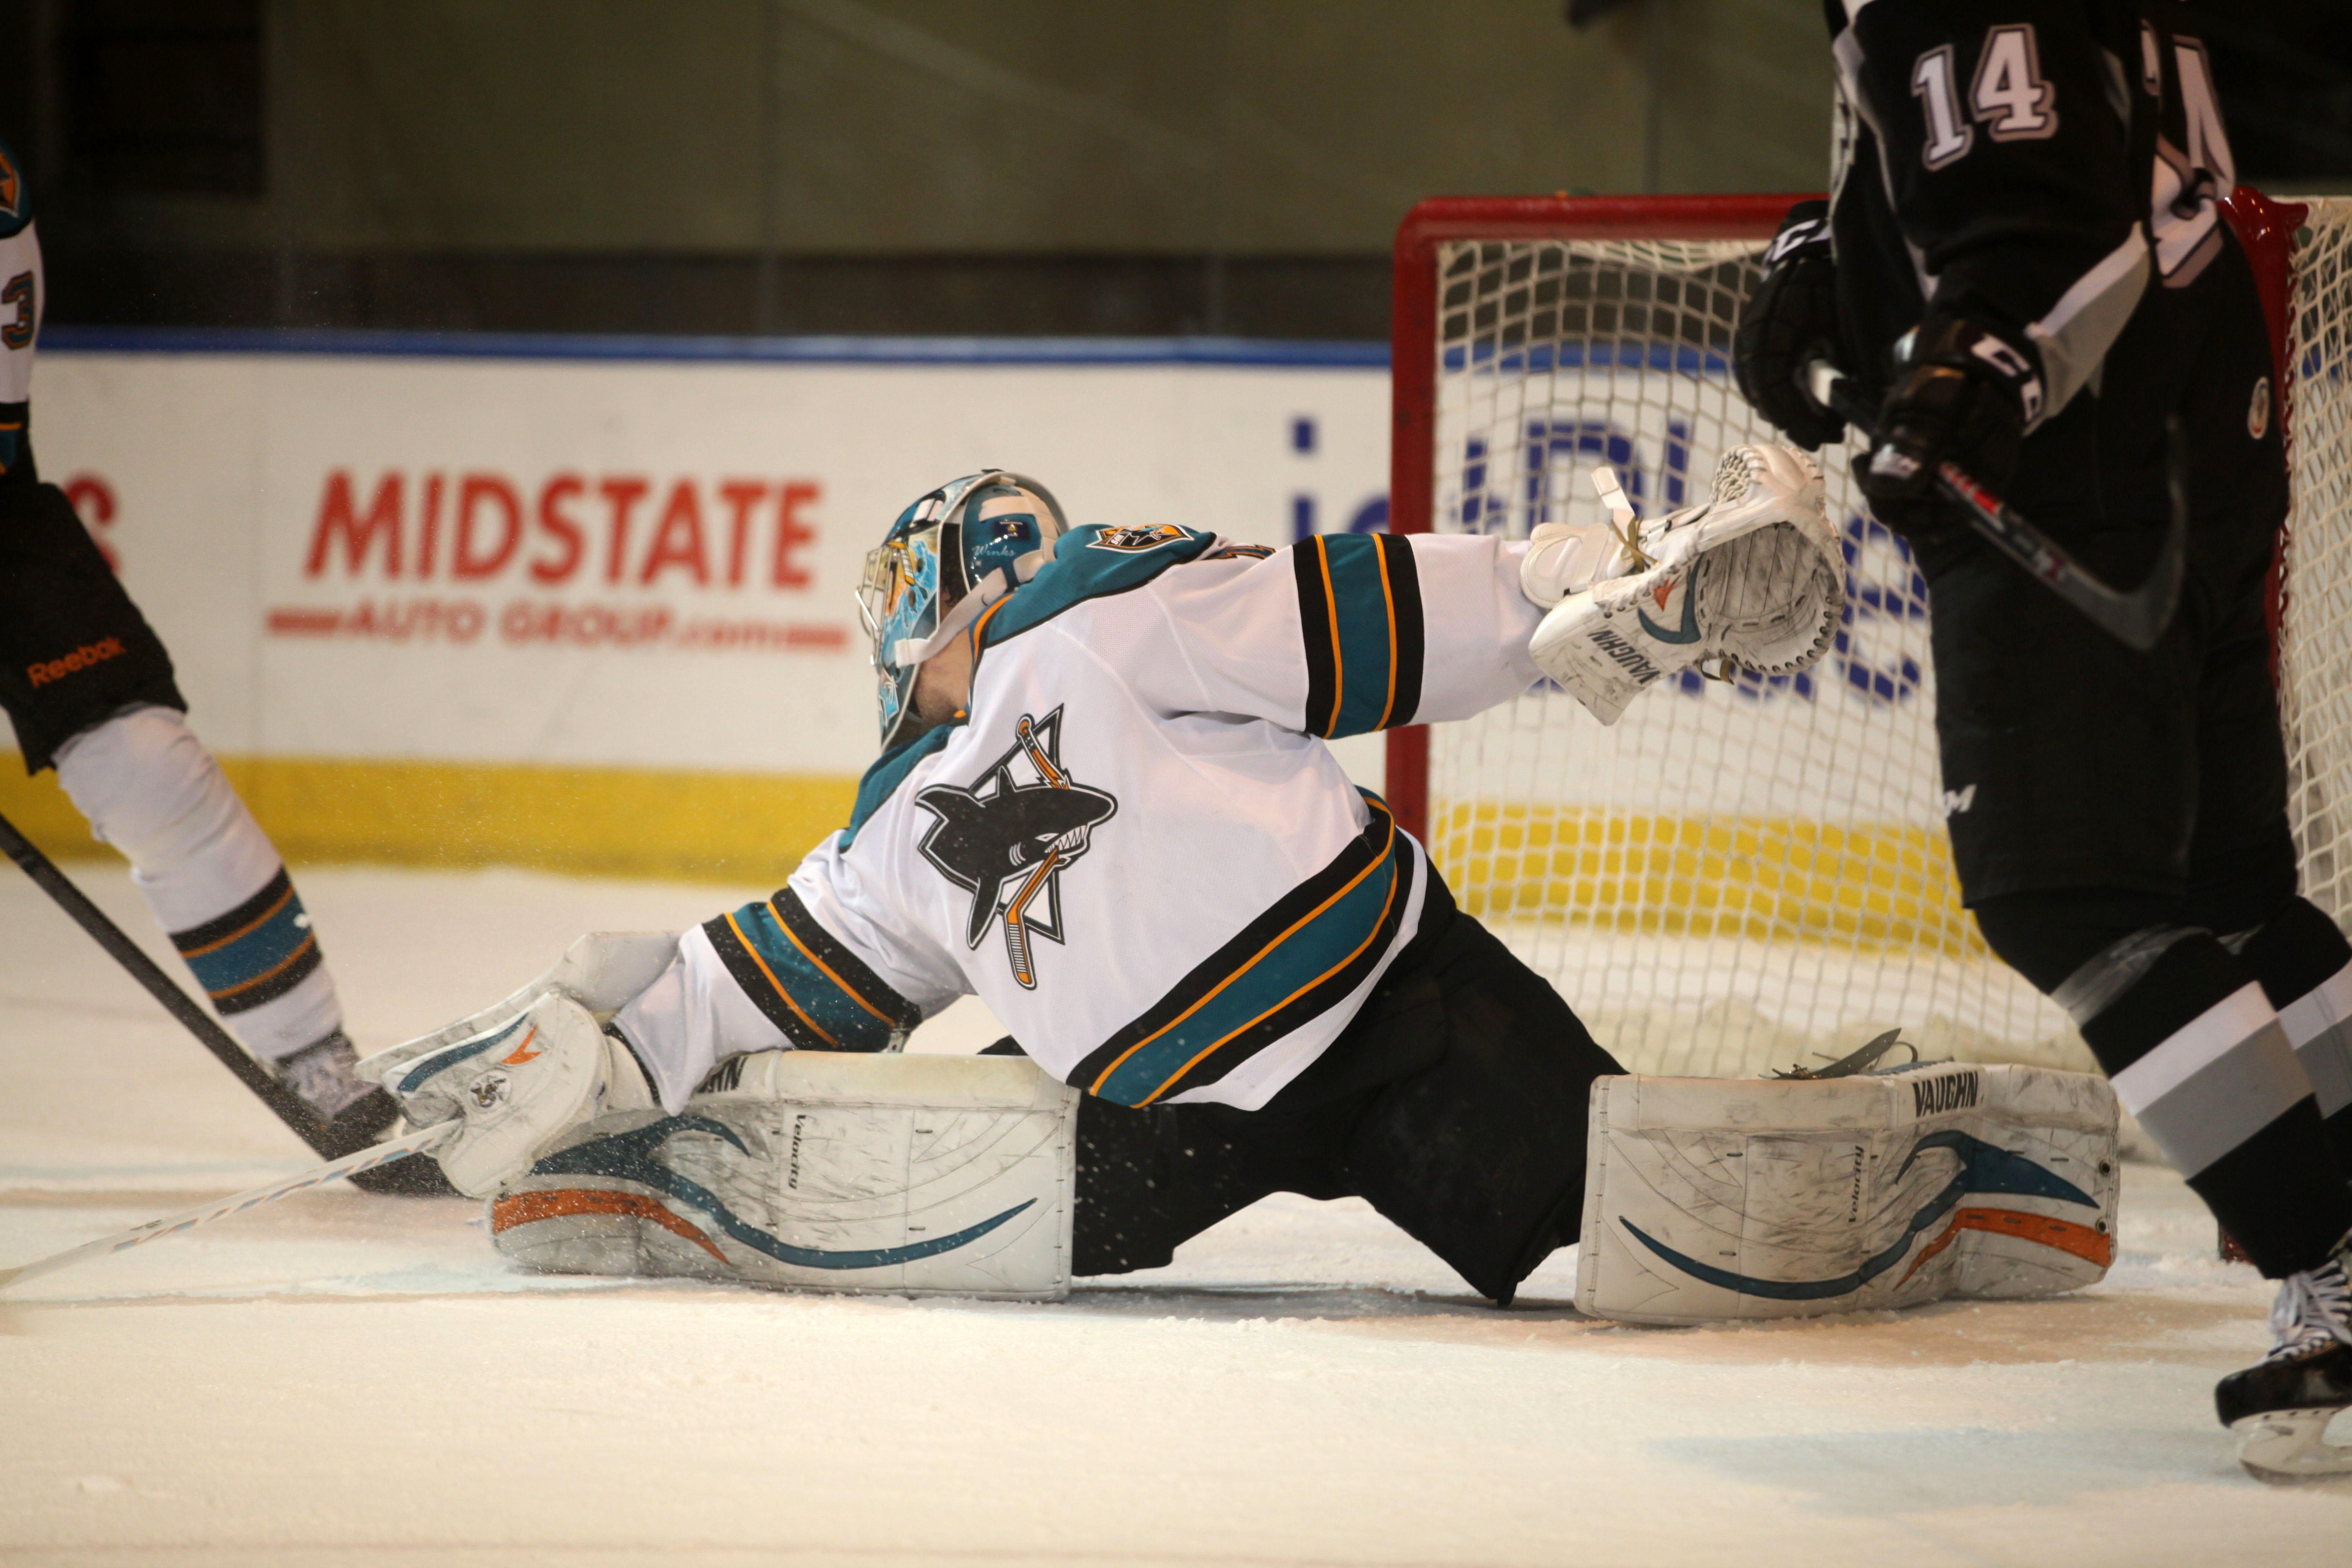 Collegehockeyplayers Com Tag San Jose Sharks Page 3 Collegehockeyplayers Com Part 3